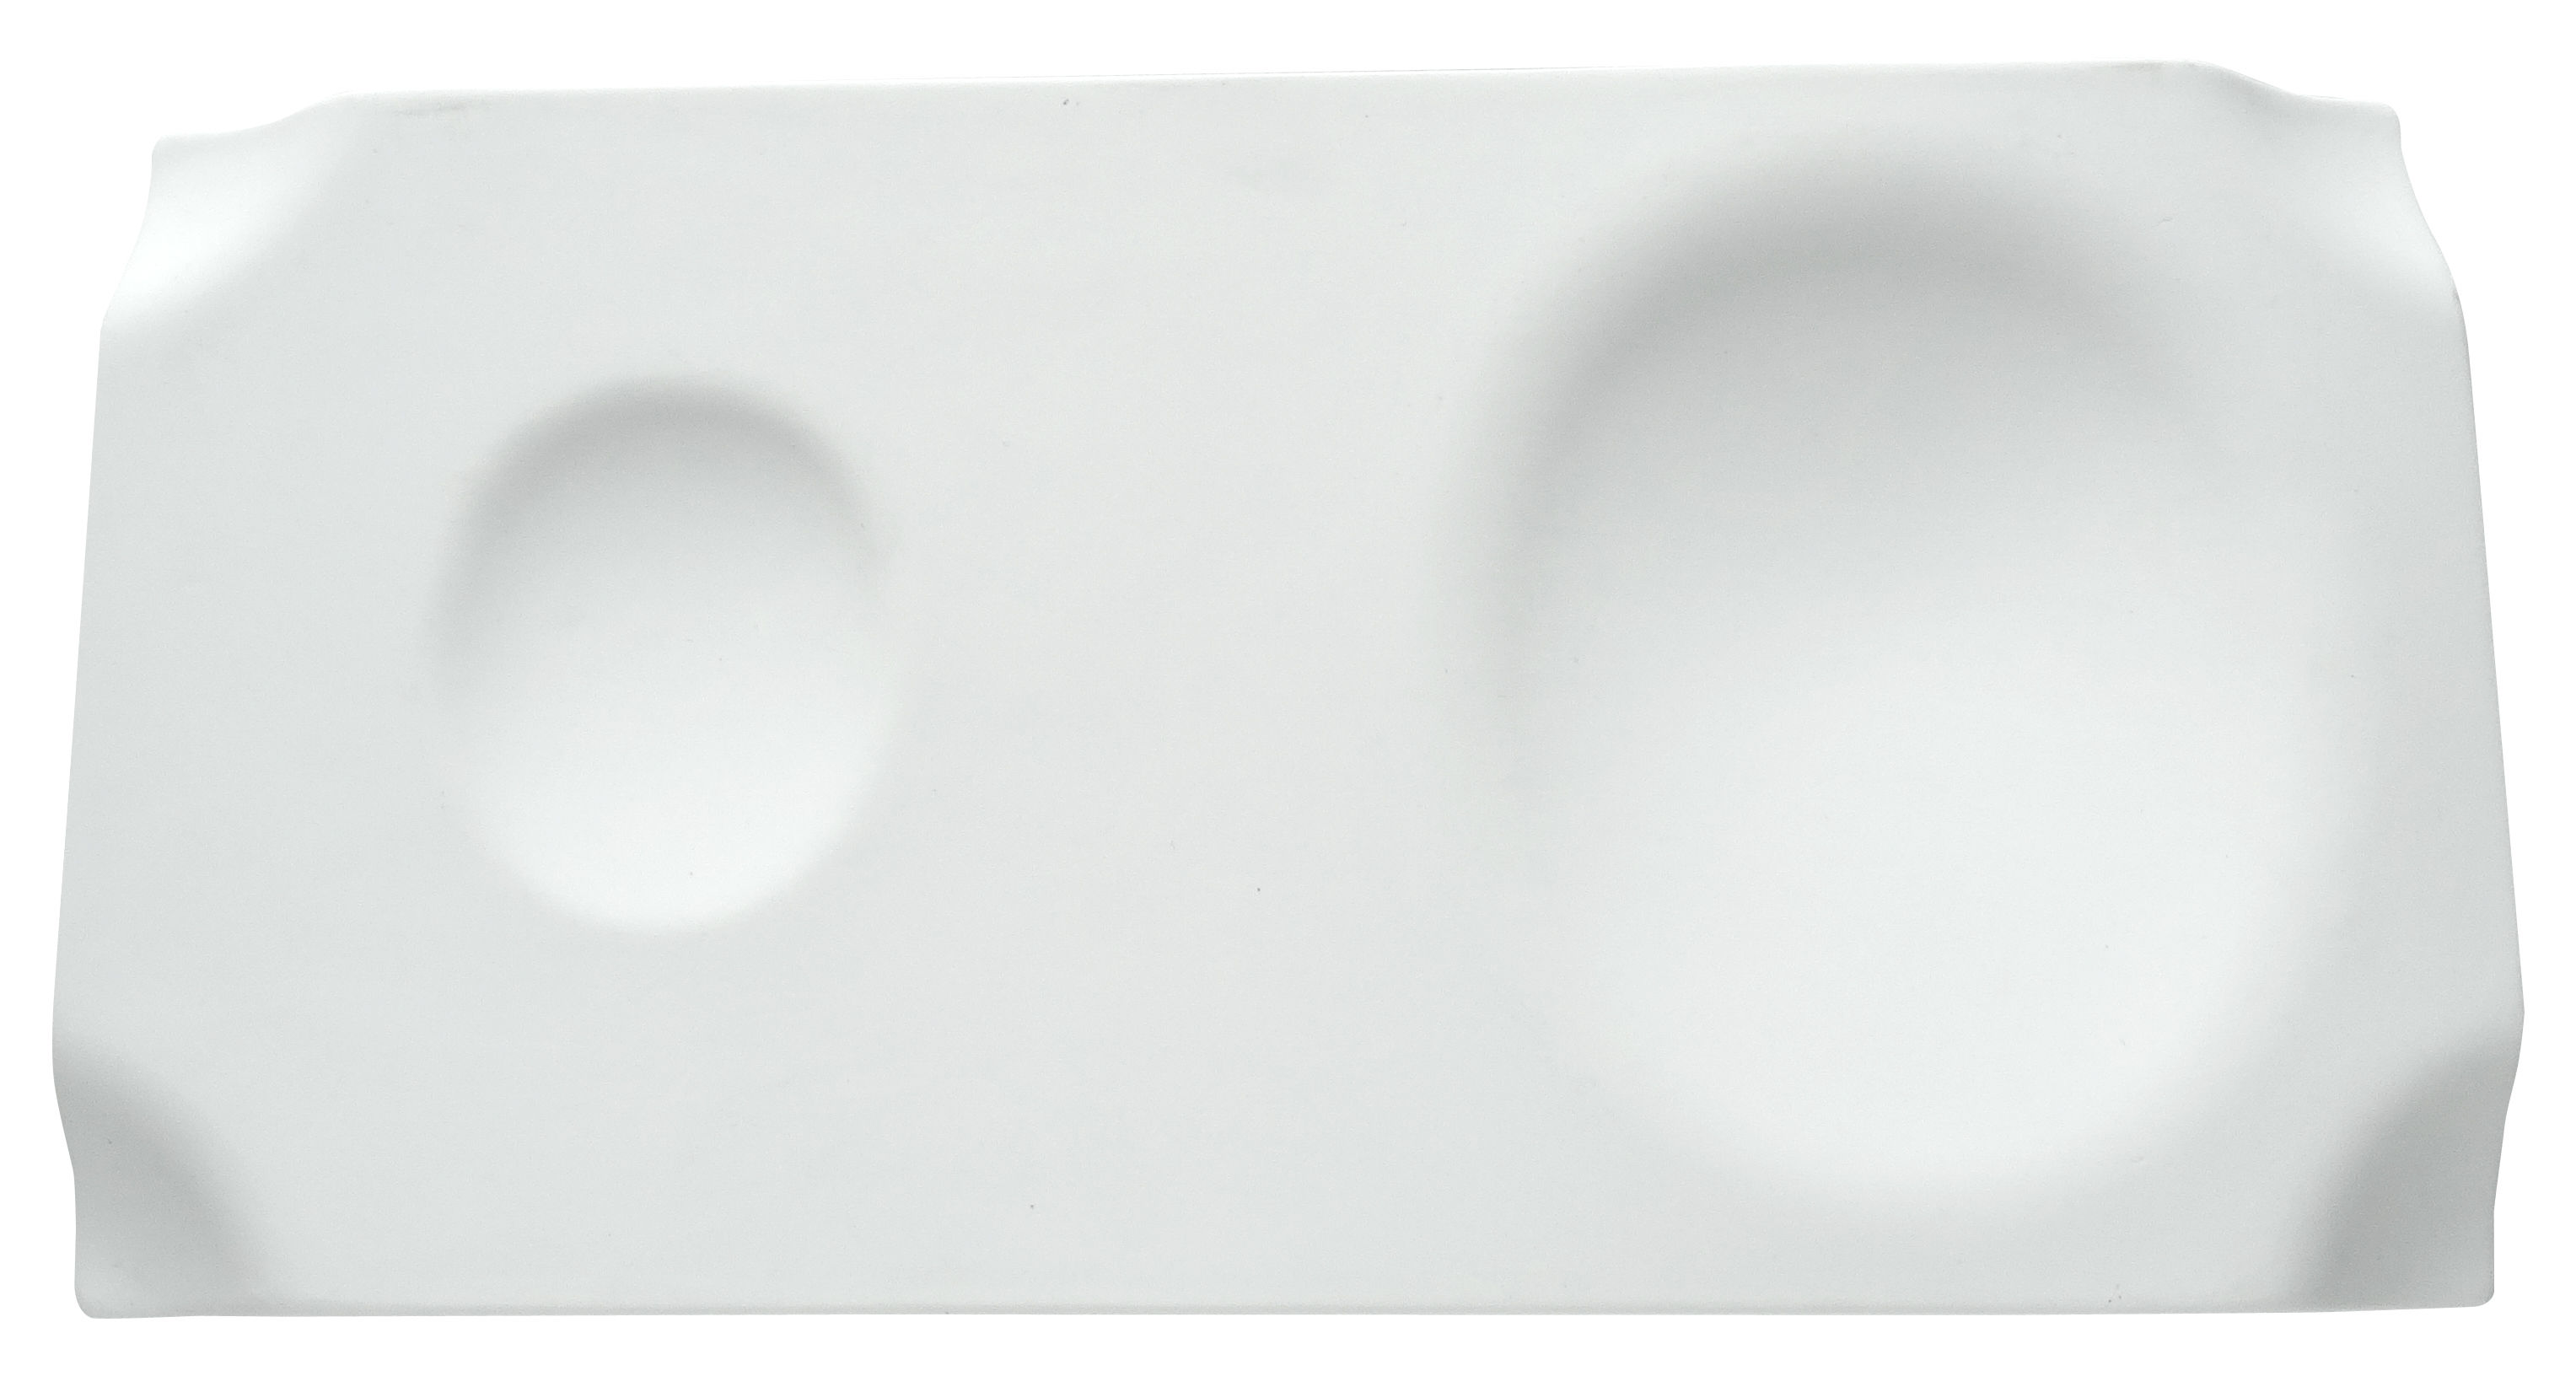 Tableware - Trays - Jo Tray - 29 x 15 cm by cookplay - Matt white - Matt porcelain